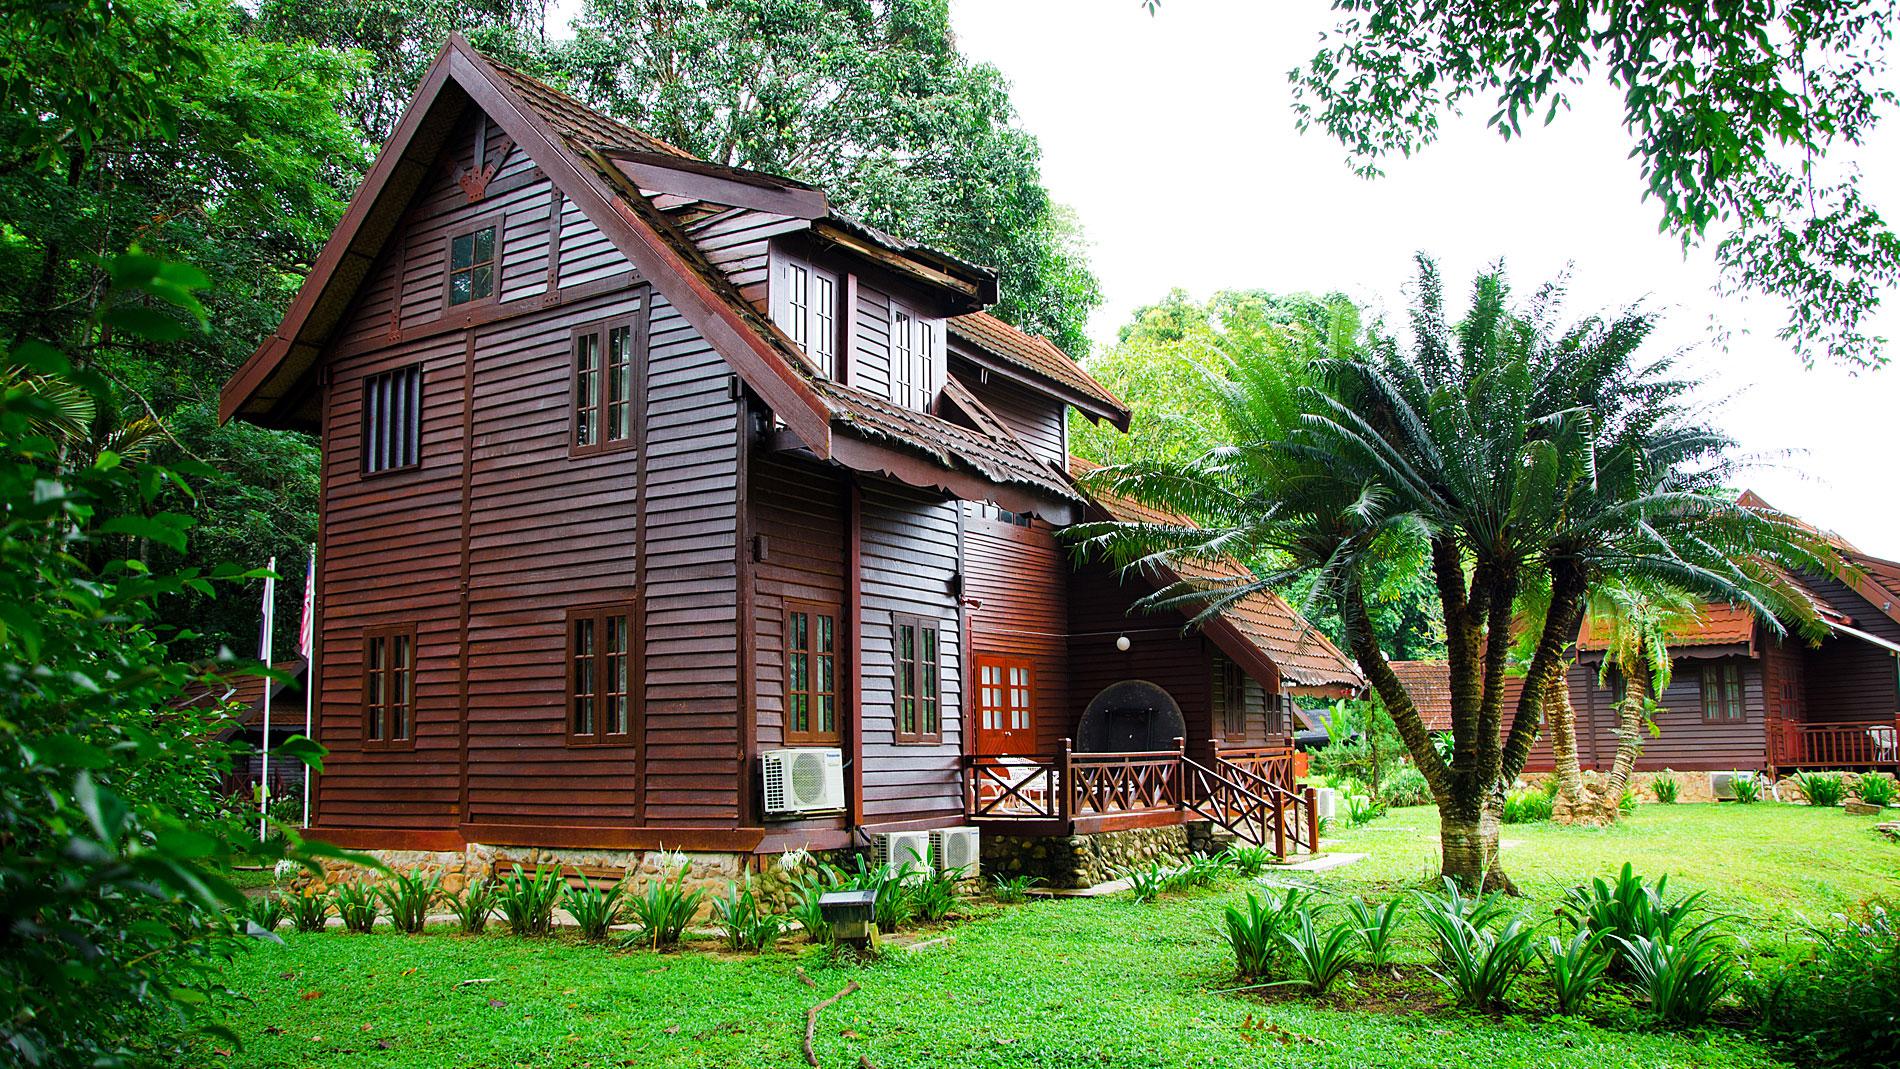 d4a036e799f4 151112121211-malaysia-rainforest-resorts-mutiara-taman-negara-resort-pahang-3.jpg